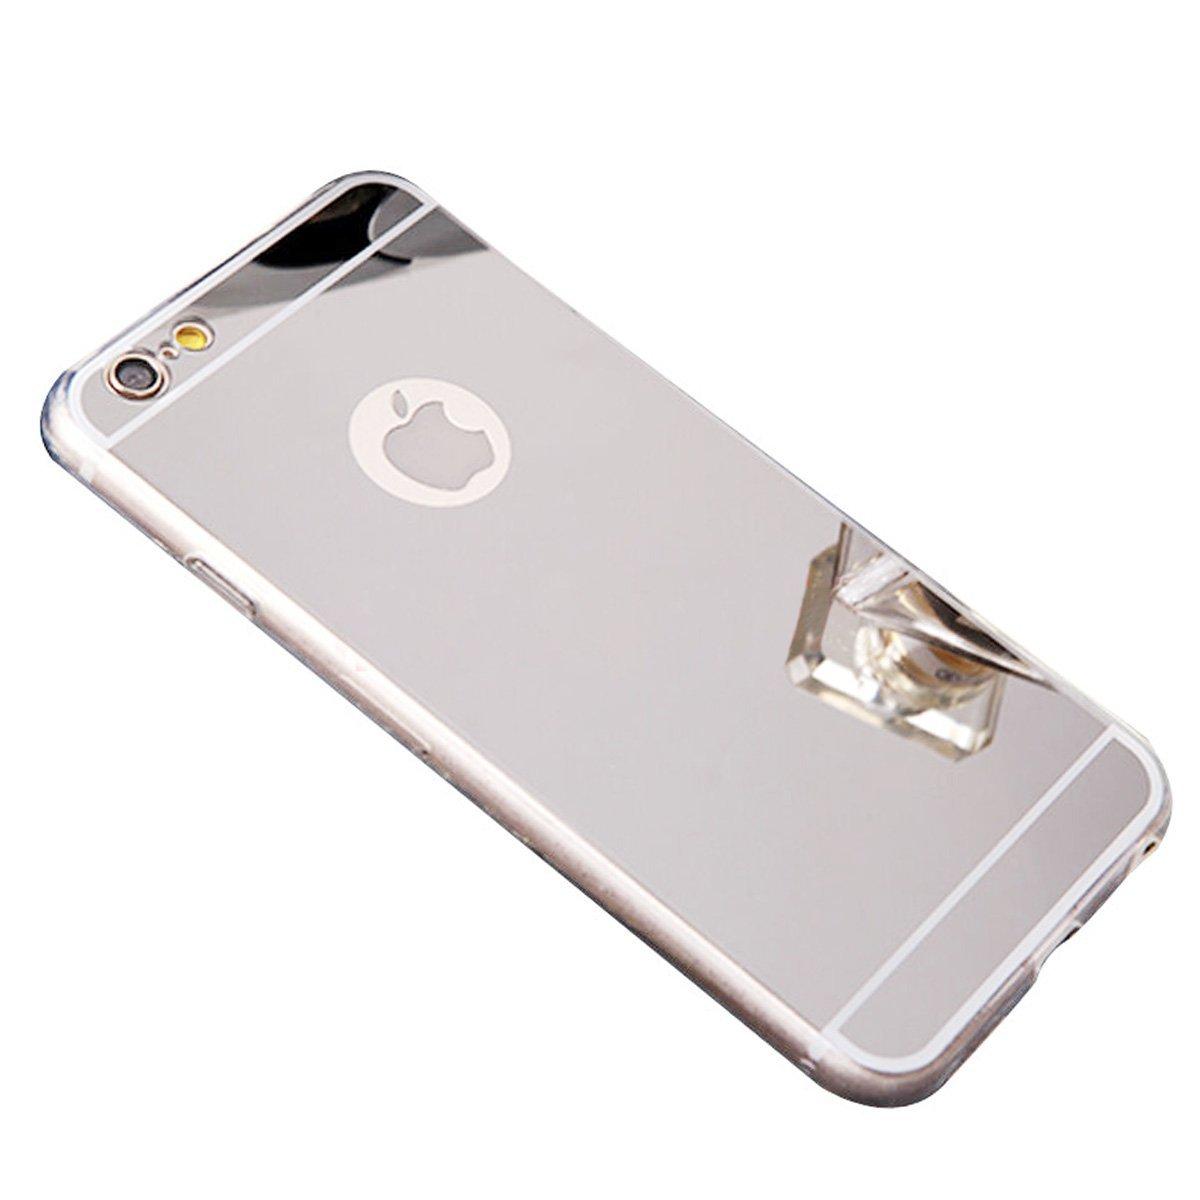 Zrcadlový kryt My Mirror pro iPhone 6s Plus / 6 Plus - Stříbrný (silver)